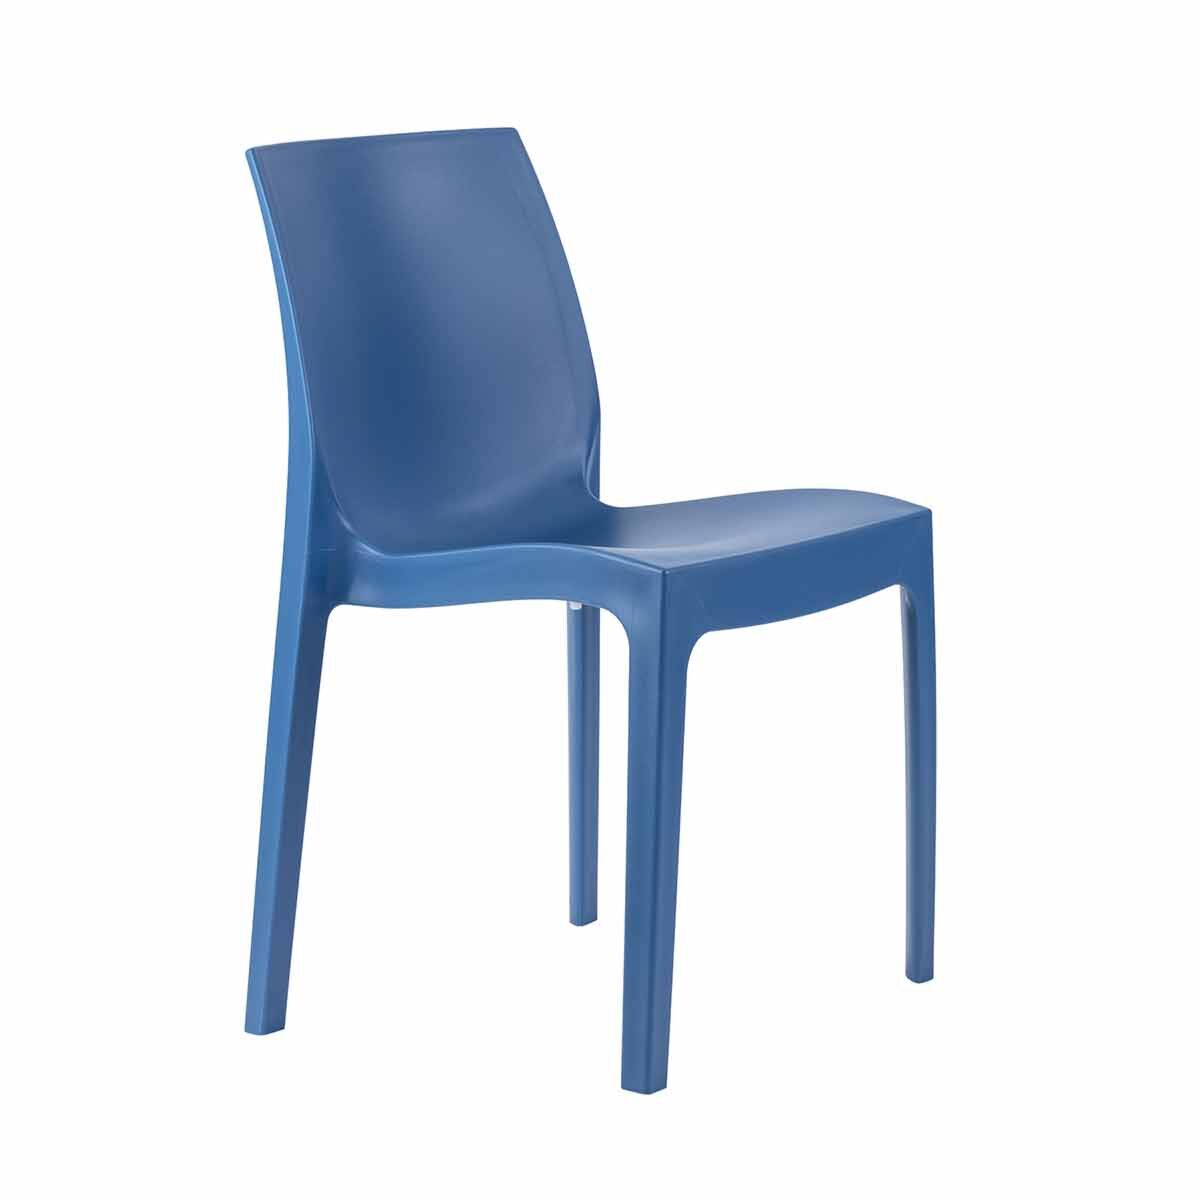 Tabilo Strata Polypropylene Stacking Chair Blue